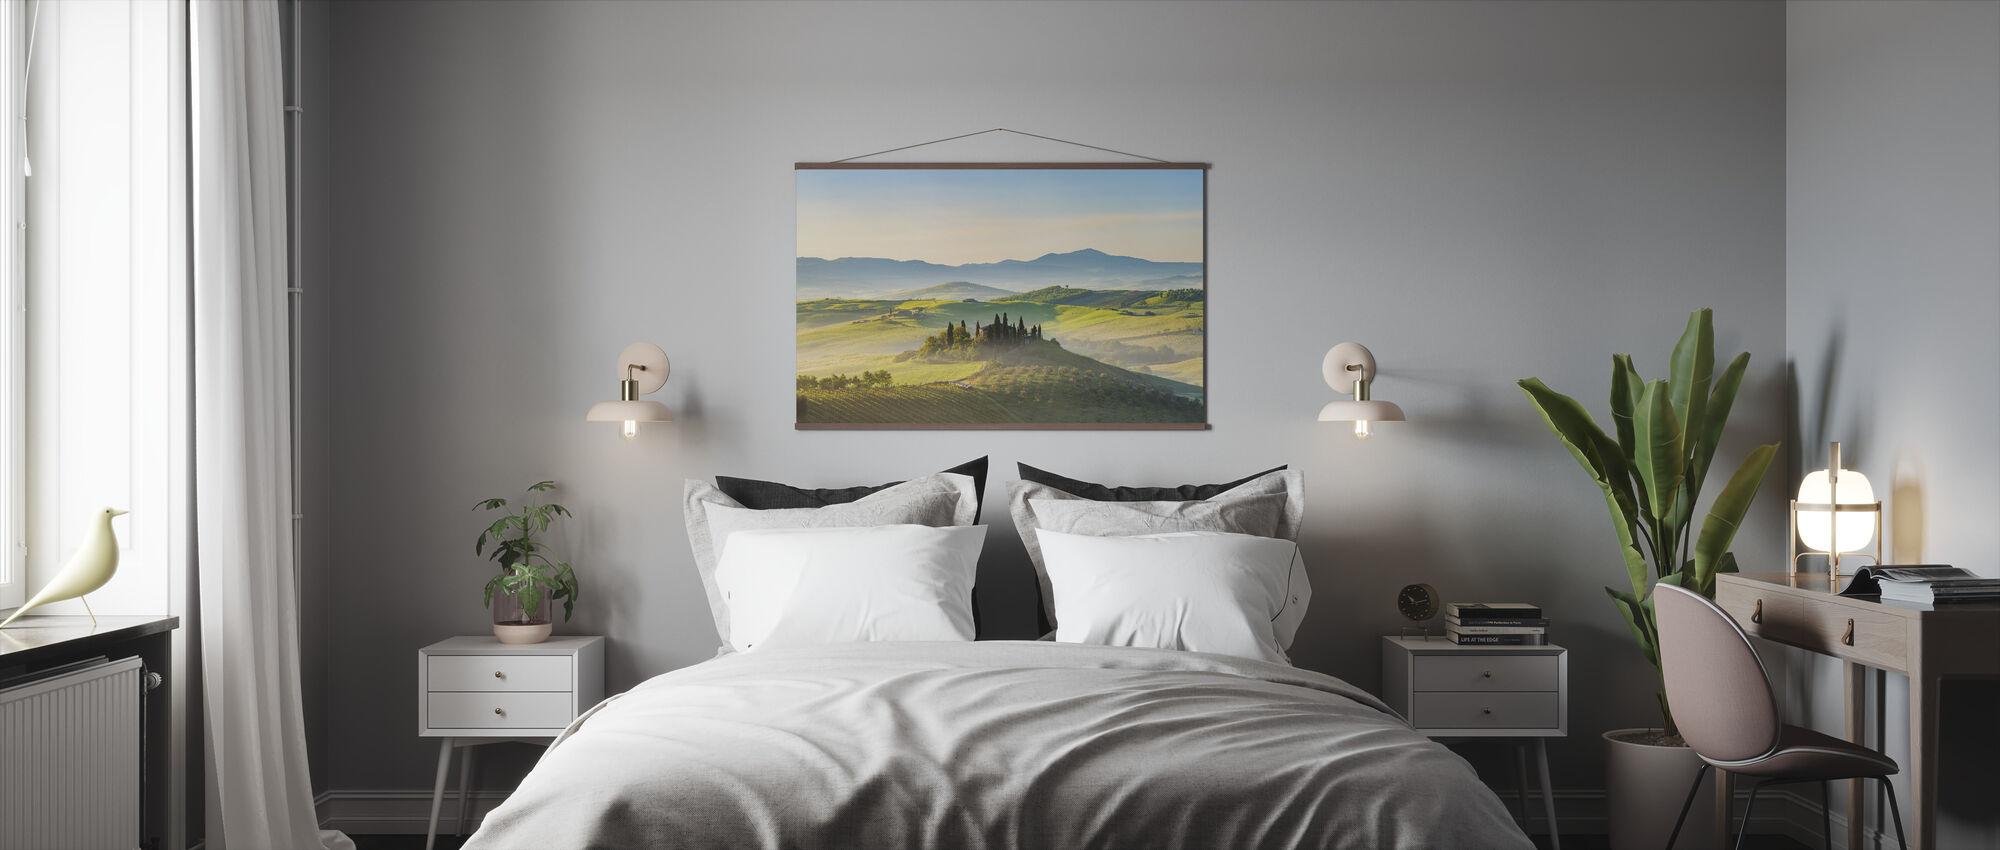 Toscana kevätaamuna - Juliste - Makuuhuone